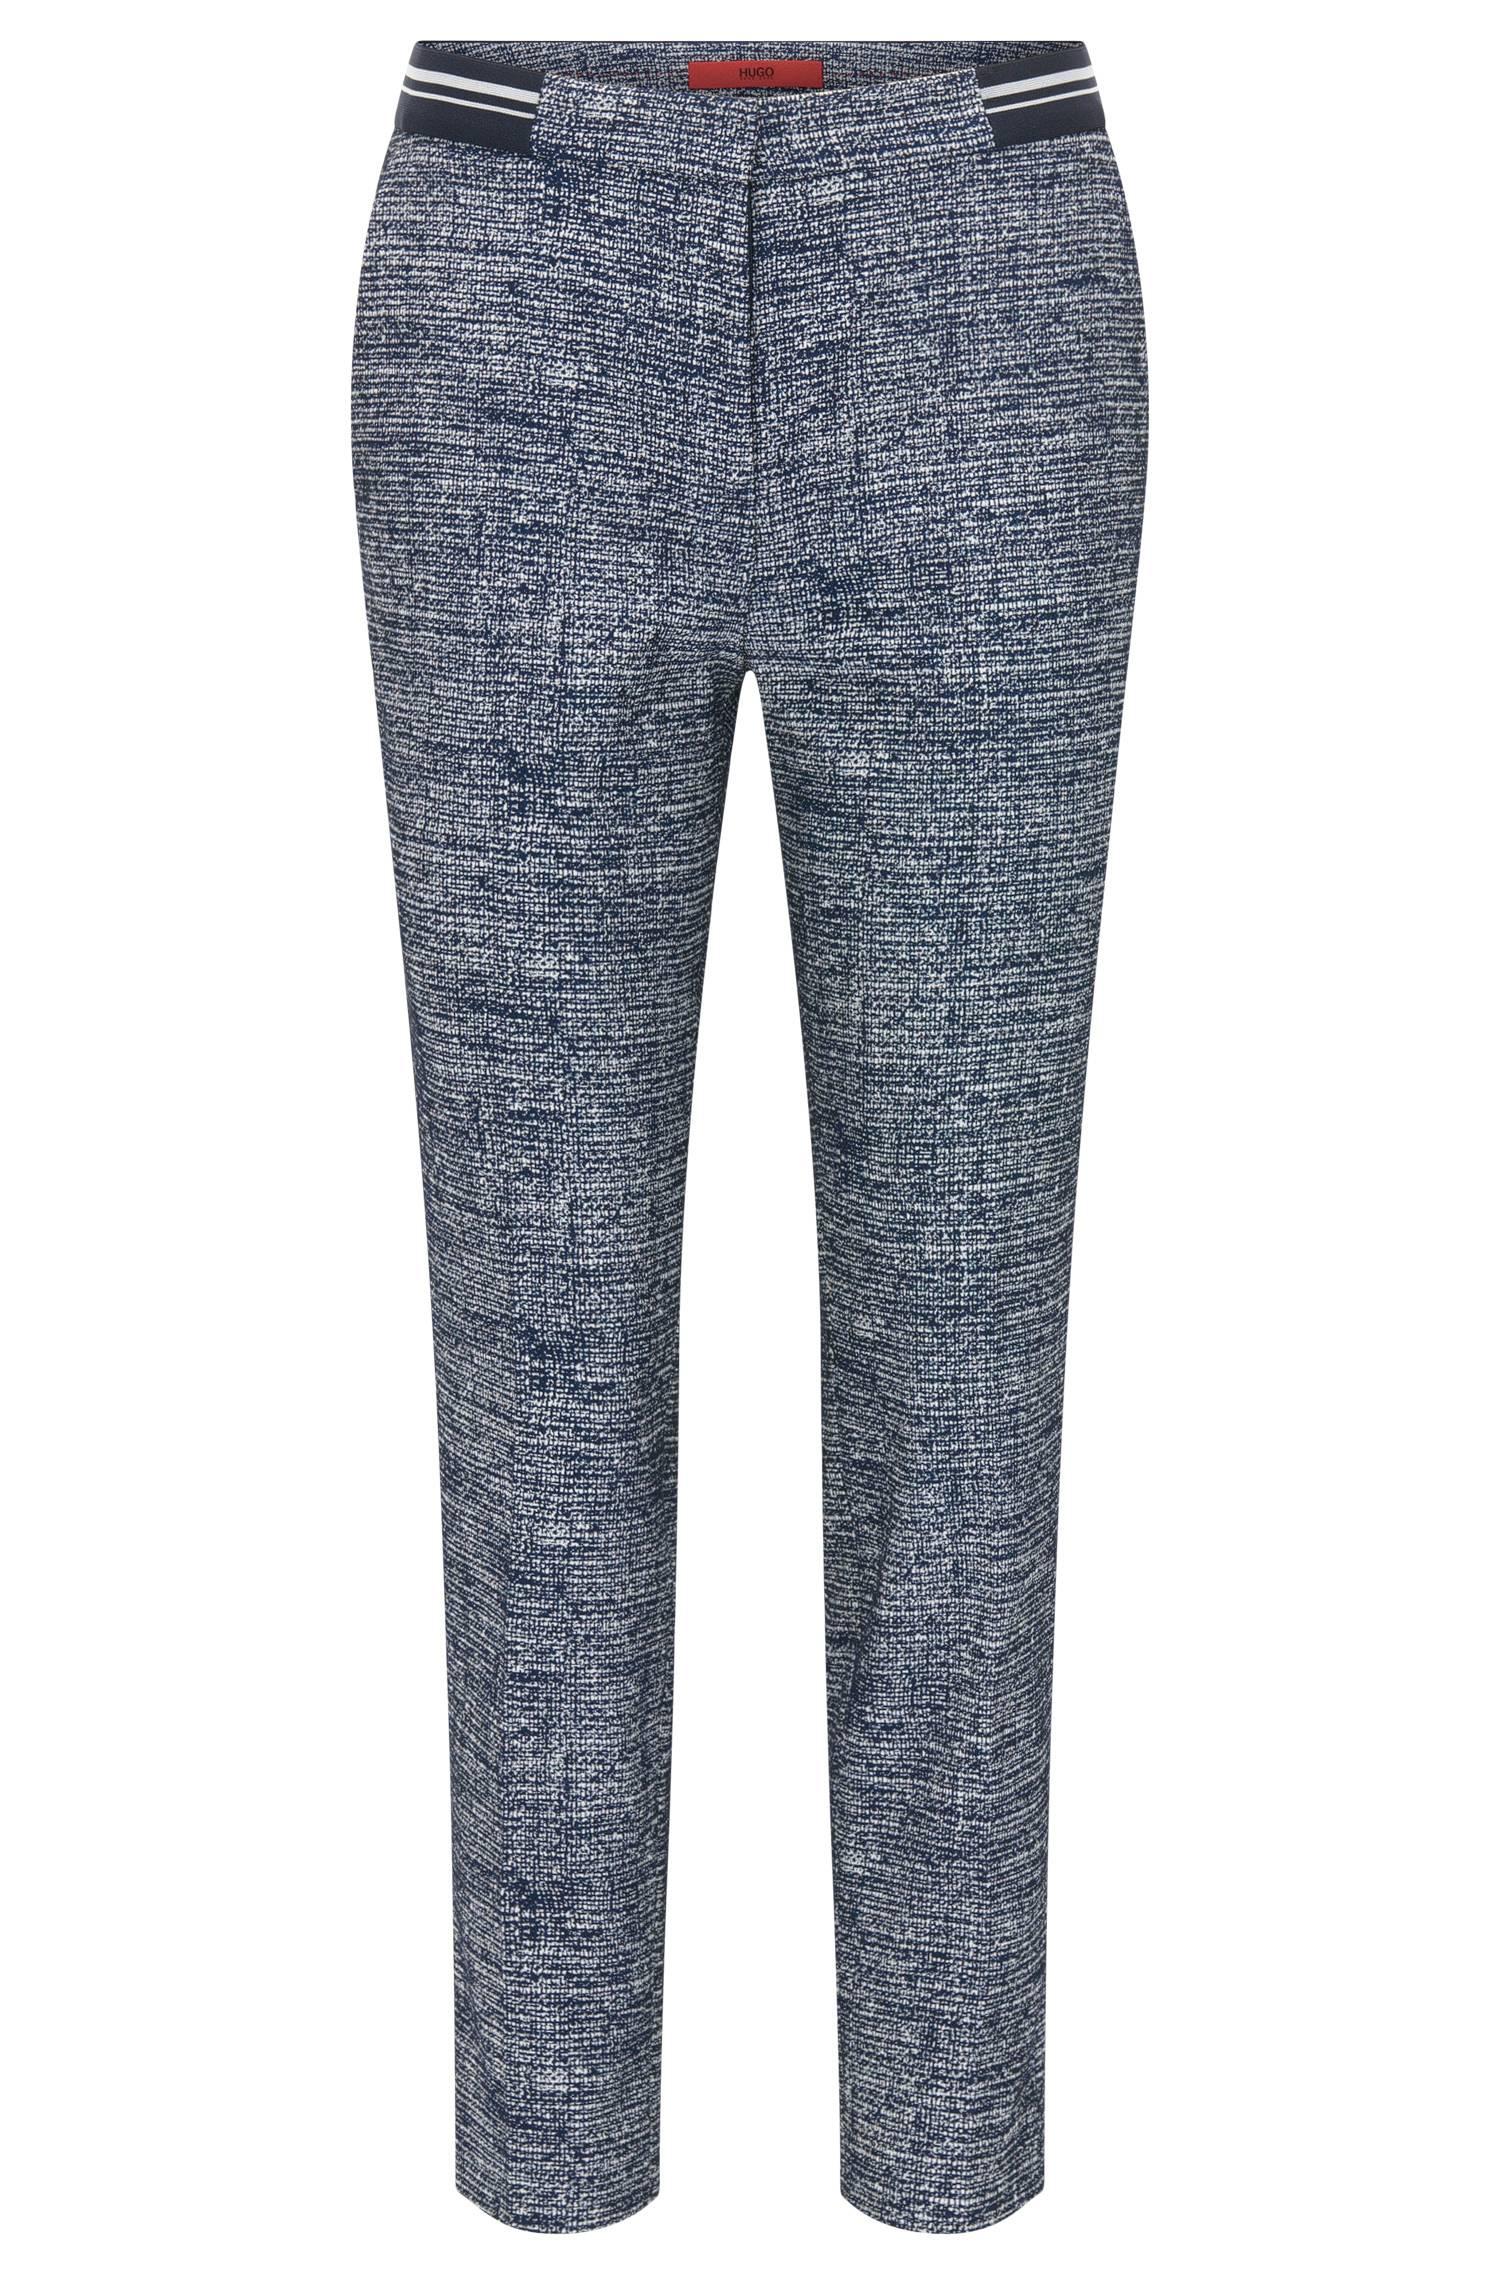 Slimfit trousers in cotton blend tweed